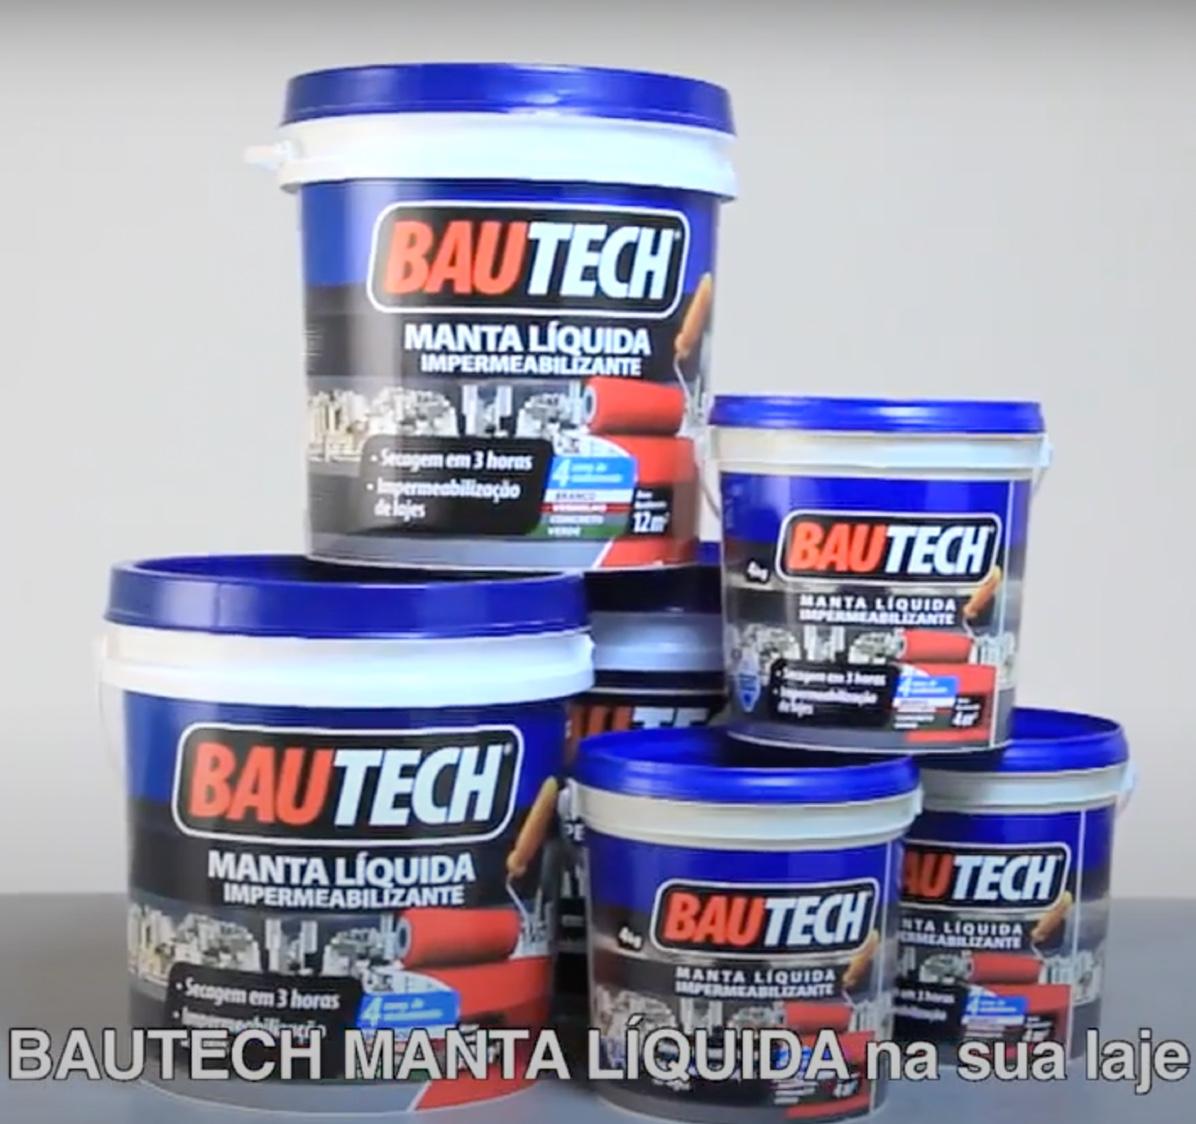 Bautech Manta Liquida 4kg